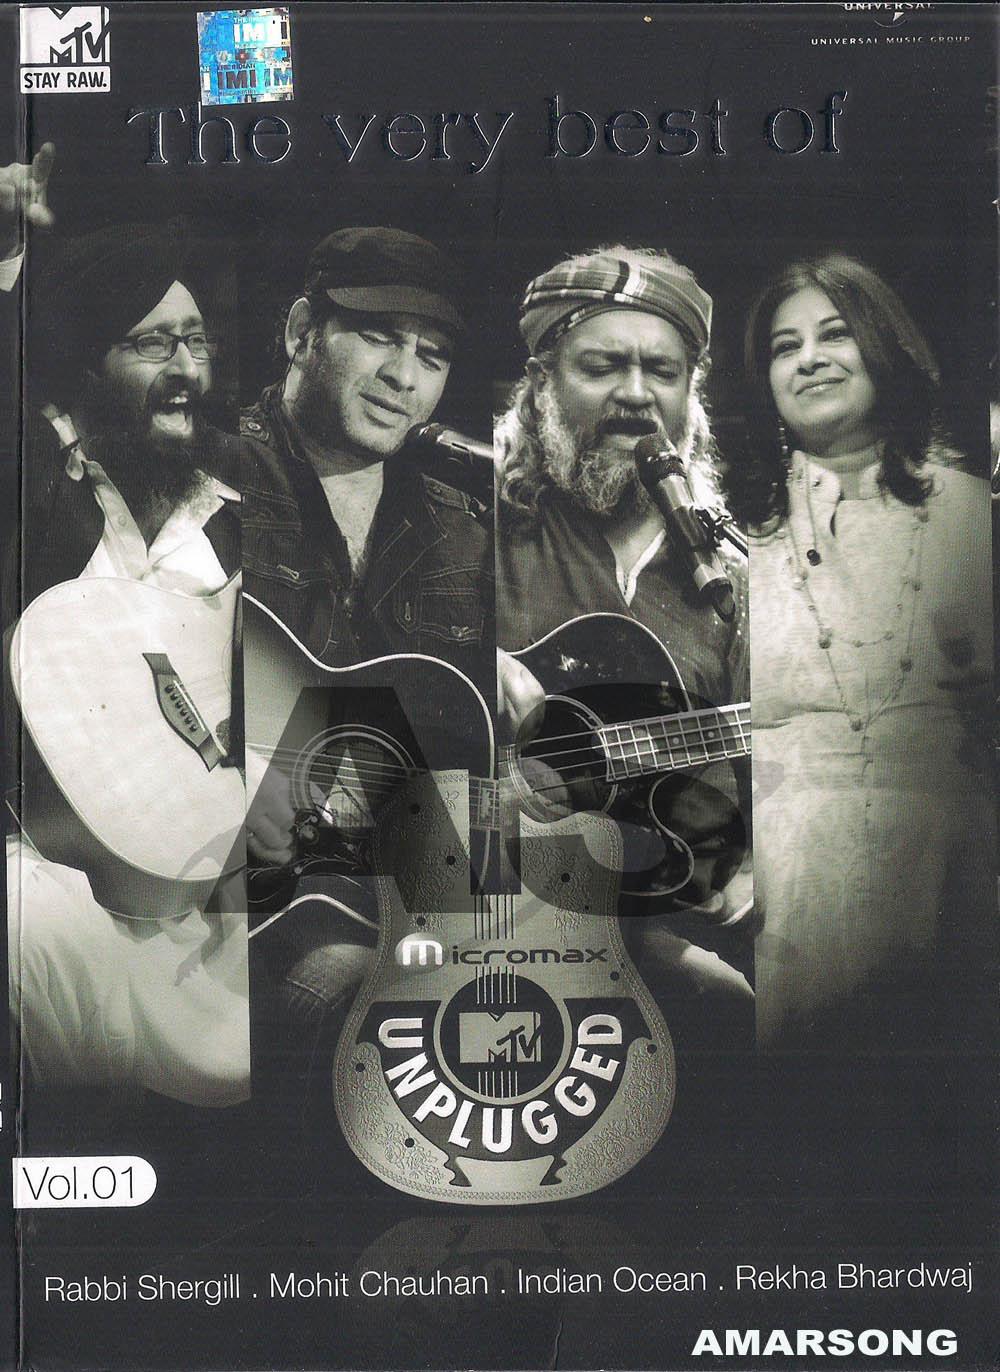 MTV Unplugged Vol 1 CD 1 Mp3 Download